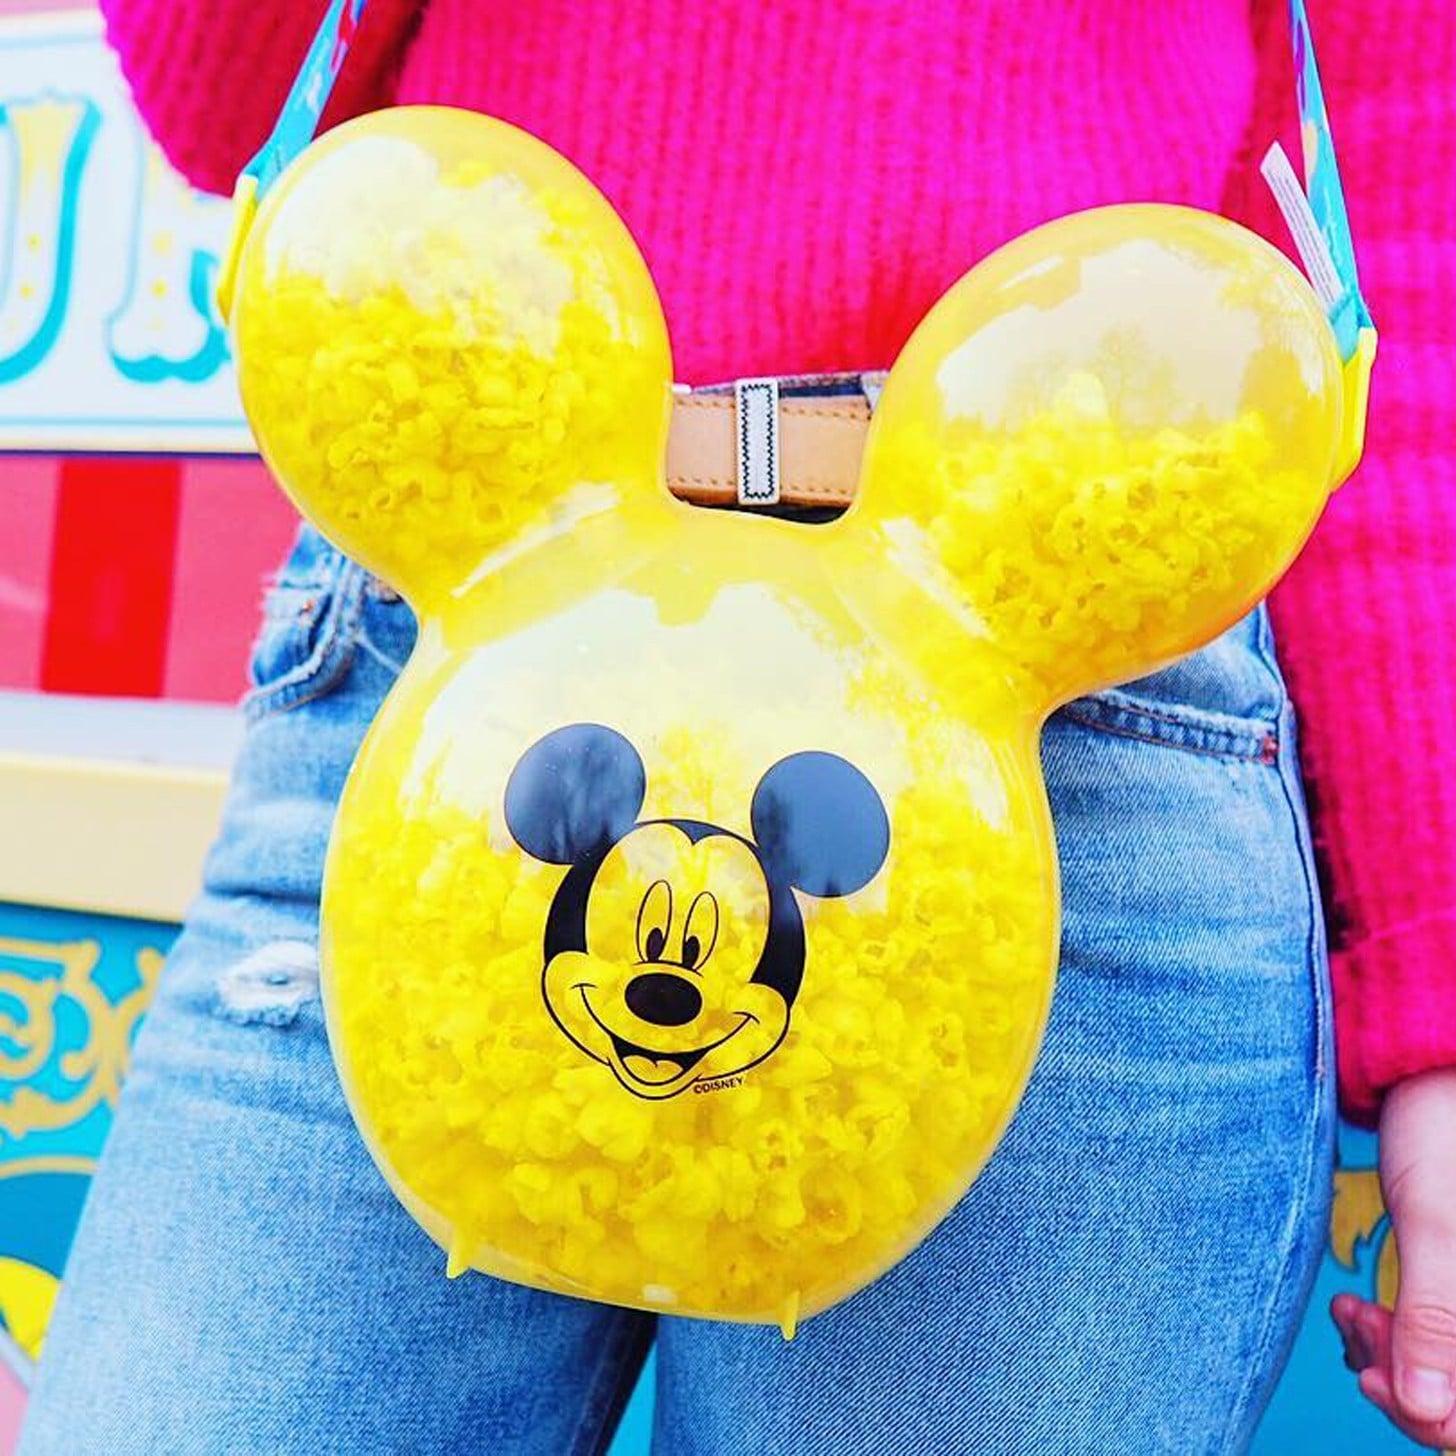 NEW Disneyland Mickey Mouse Balloon Head 60th Anniversary Popcorn Bucket Blue